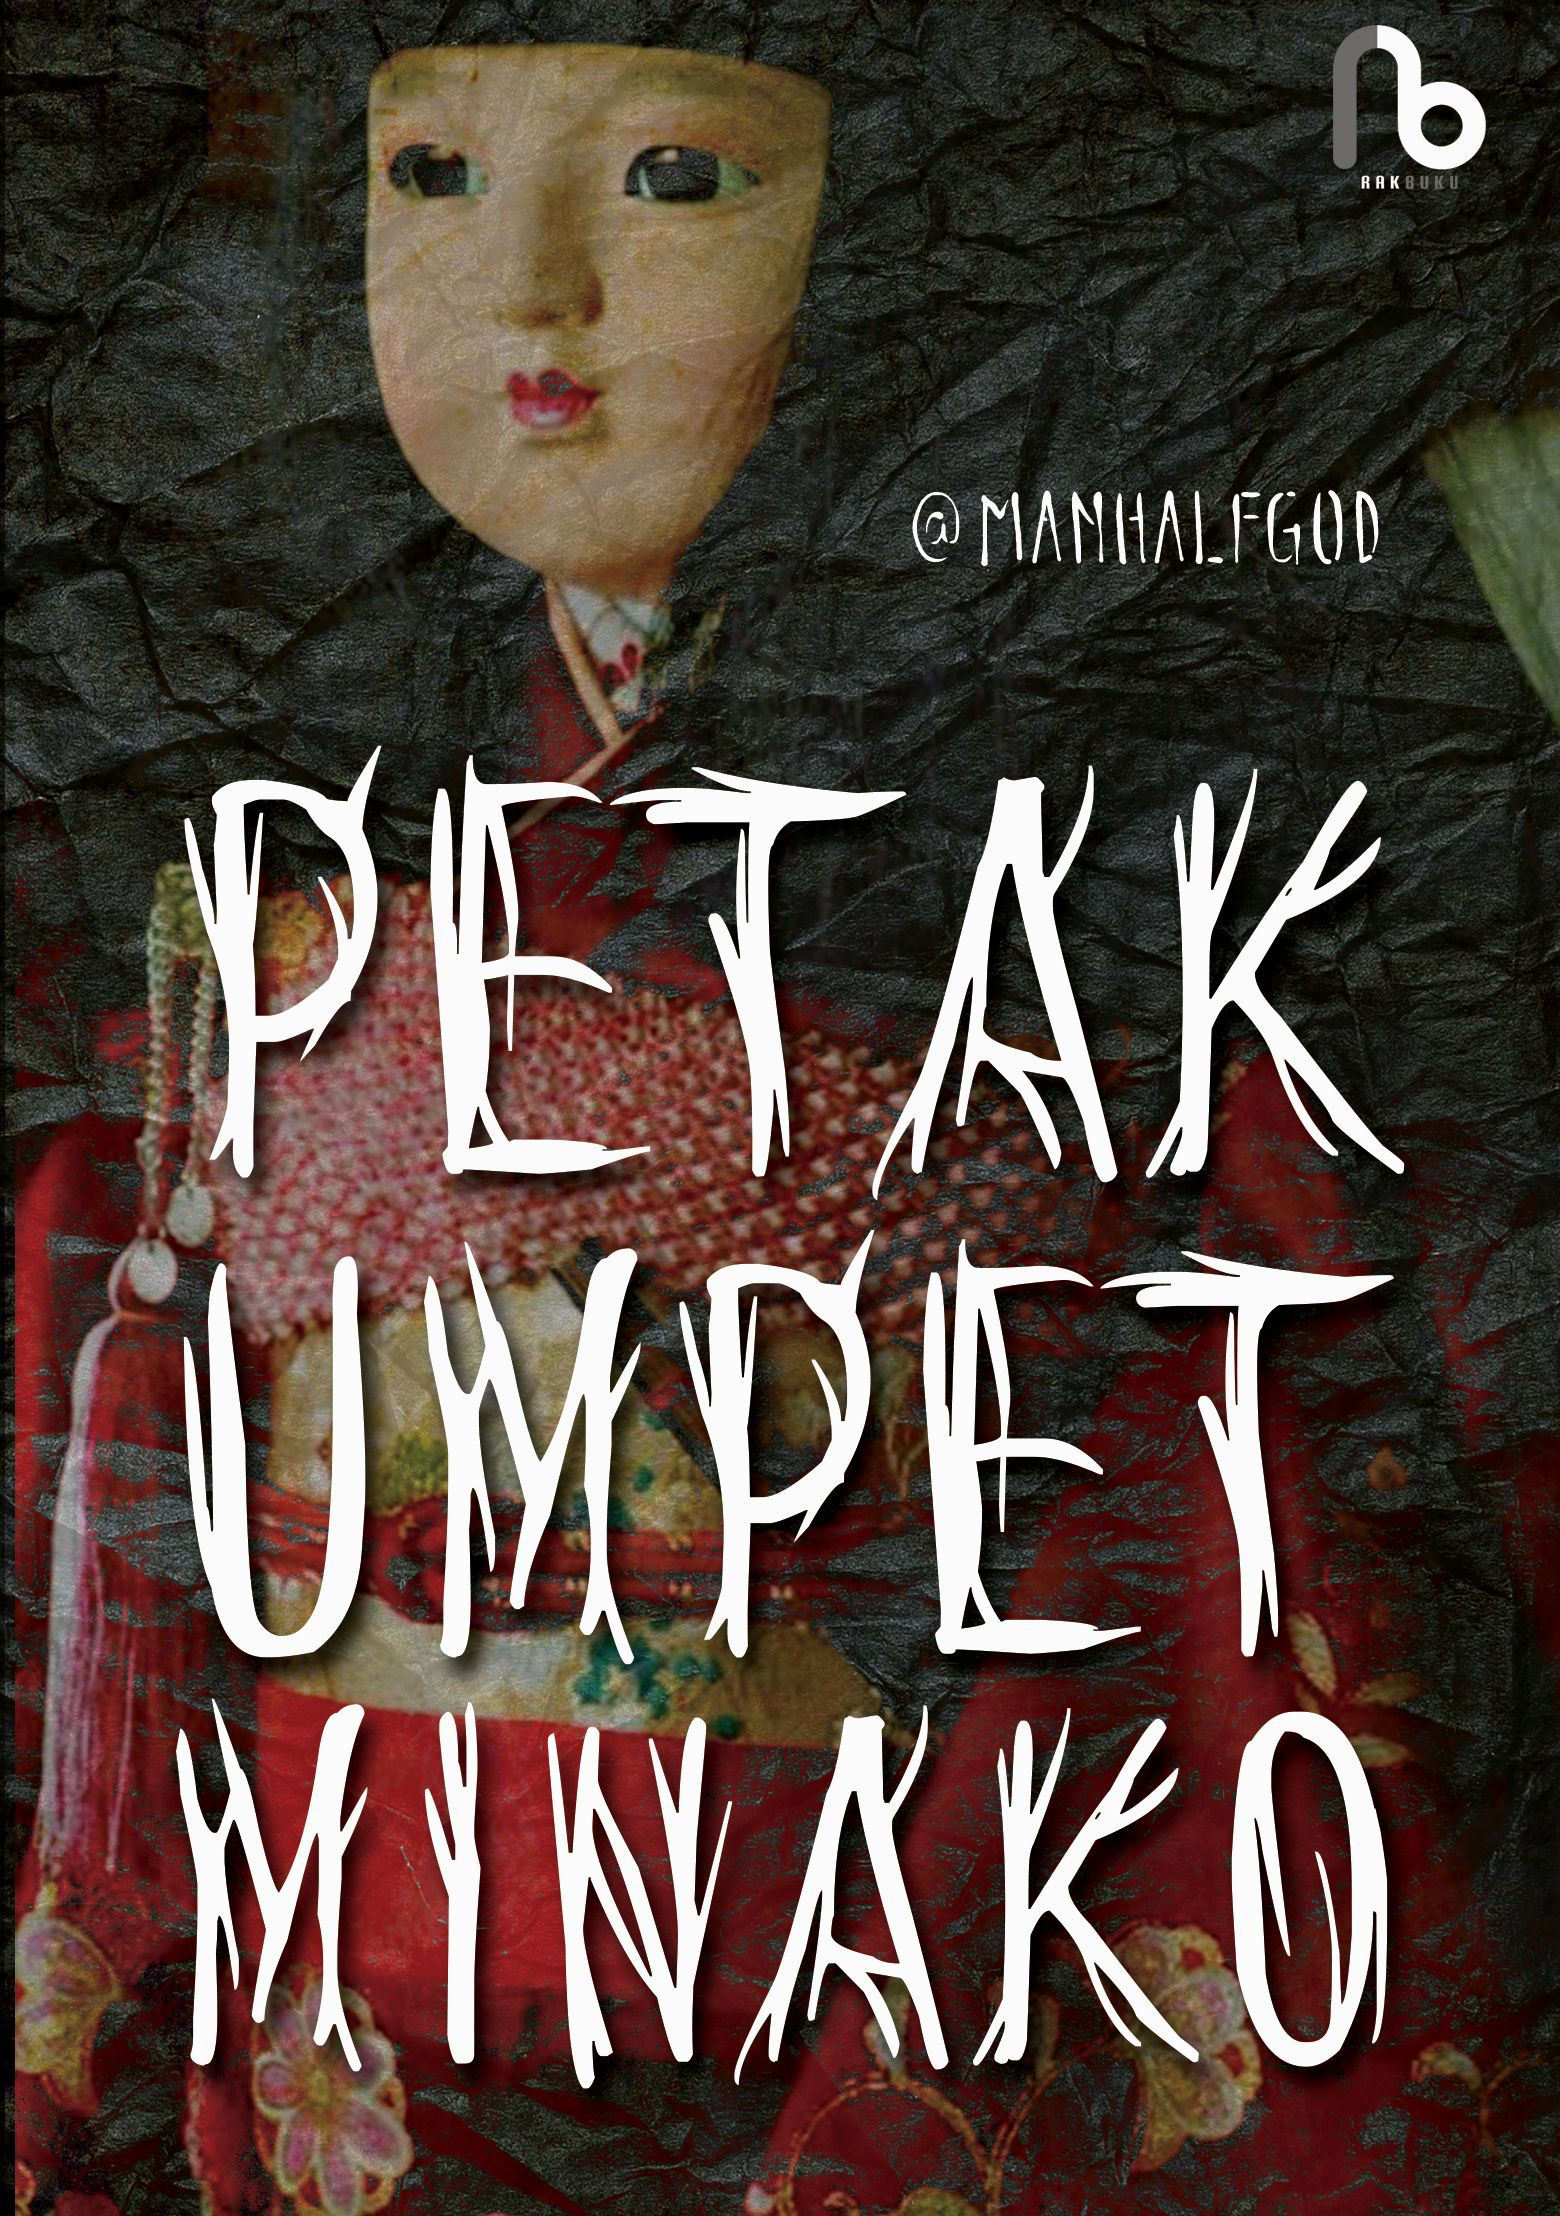 Resensi Novel Horor Petak Umpet Minako Karya MANHALFGOD